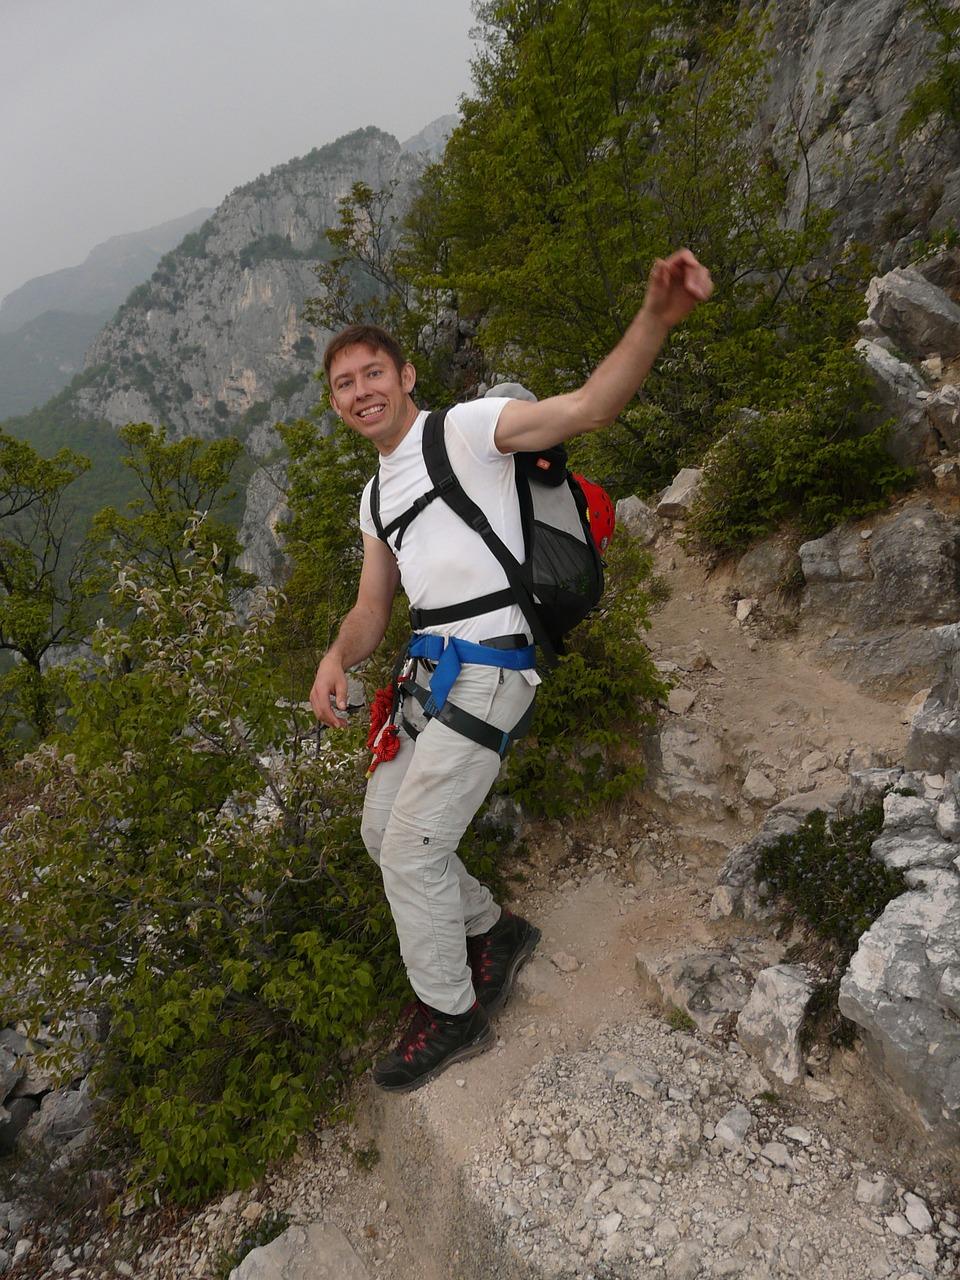 mountaineer-1512212_1280